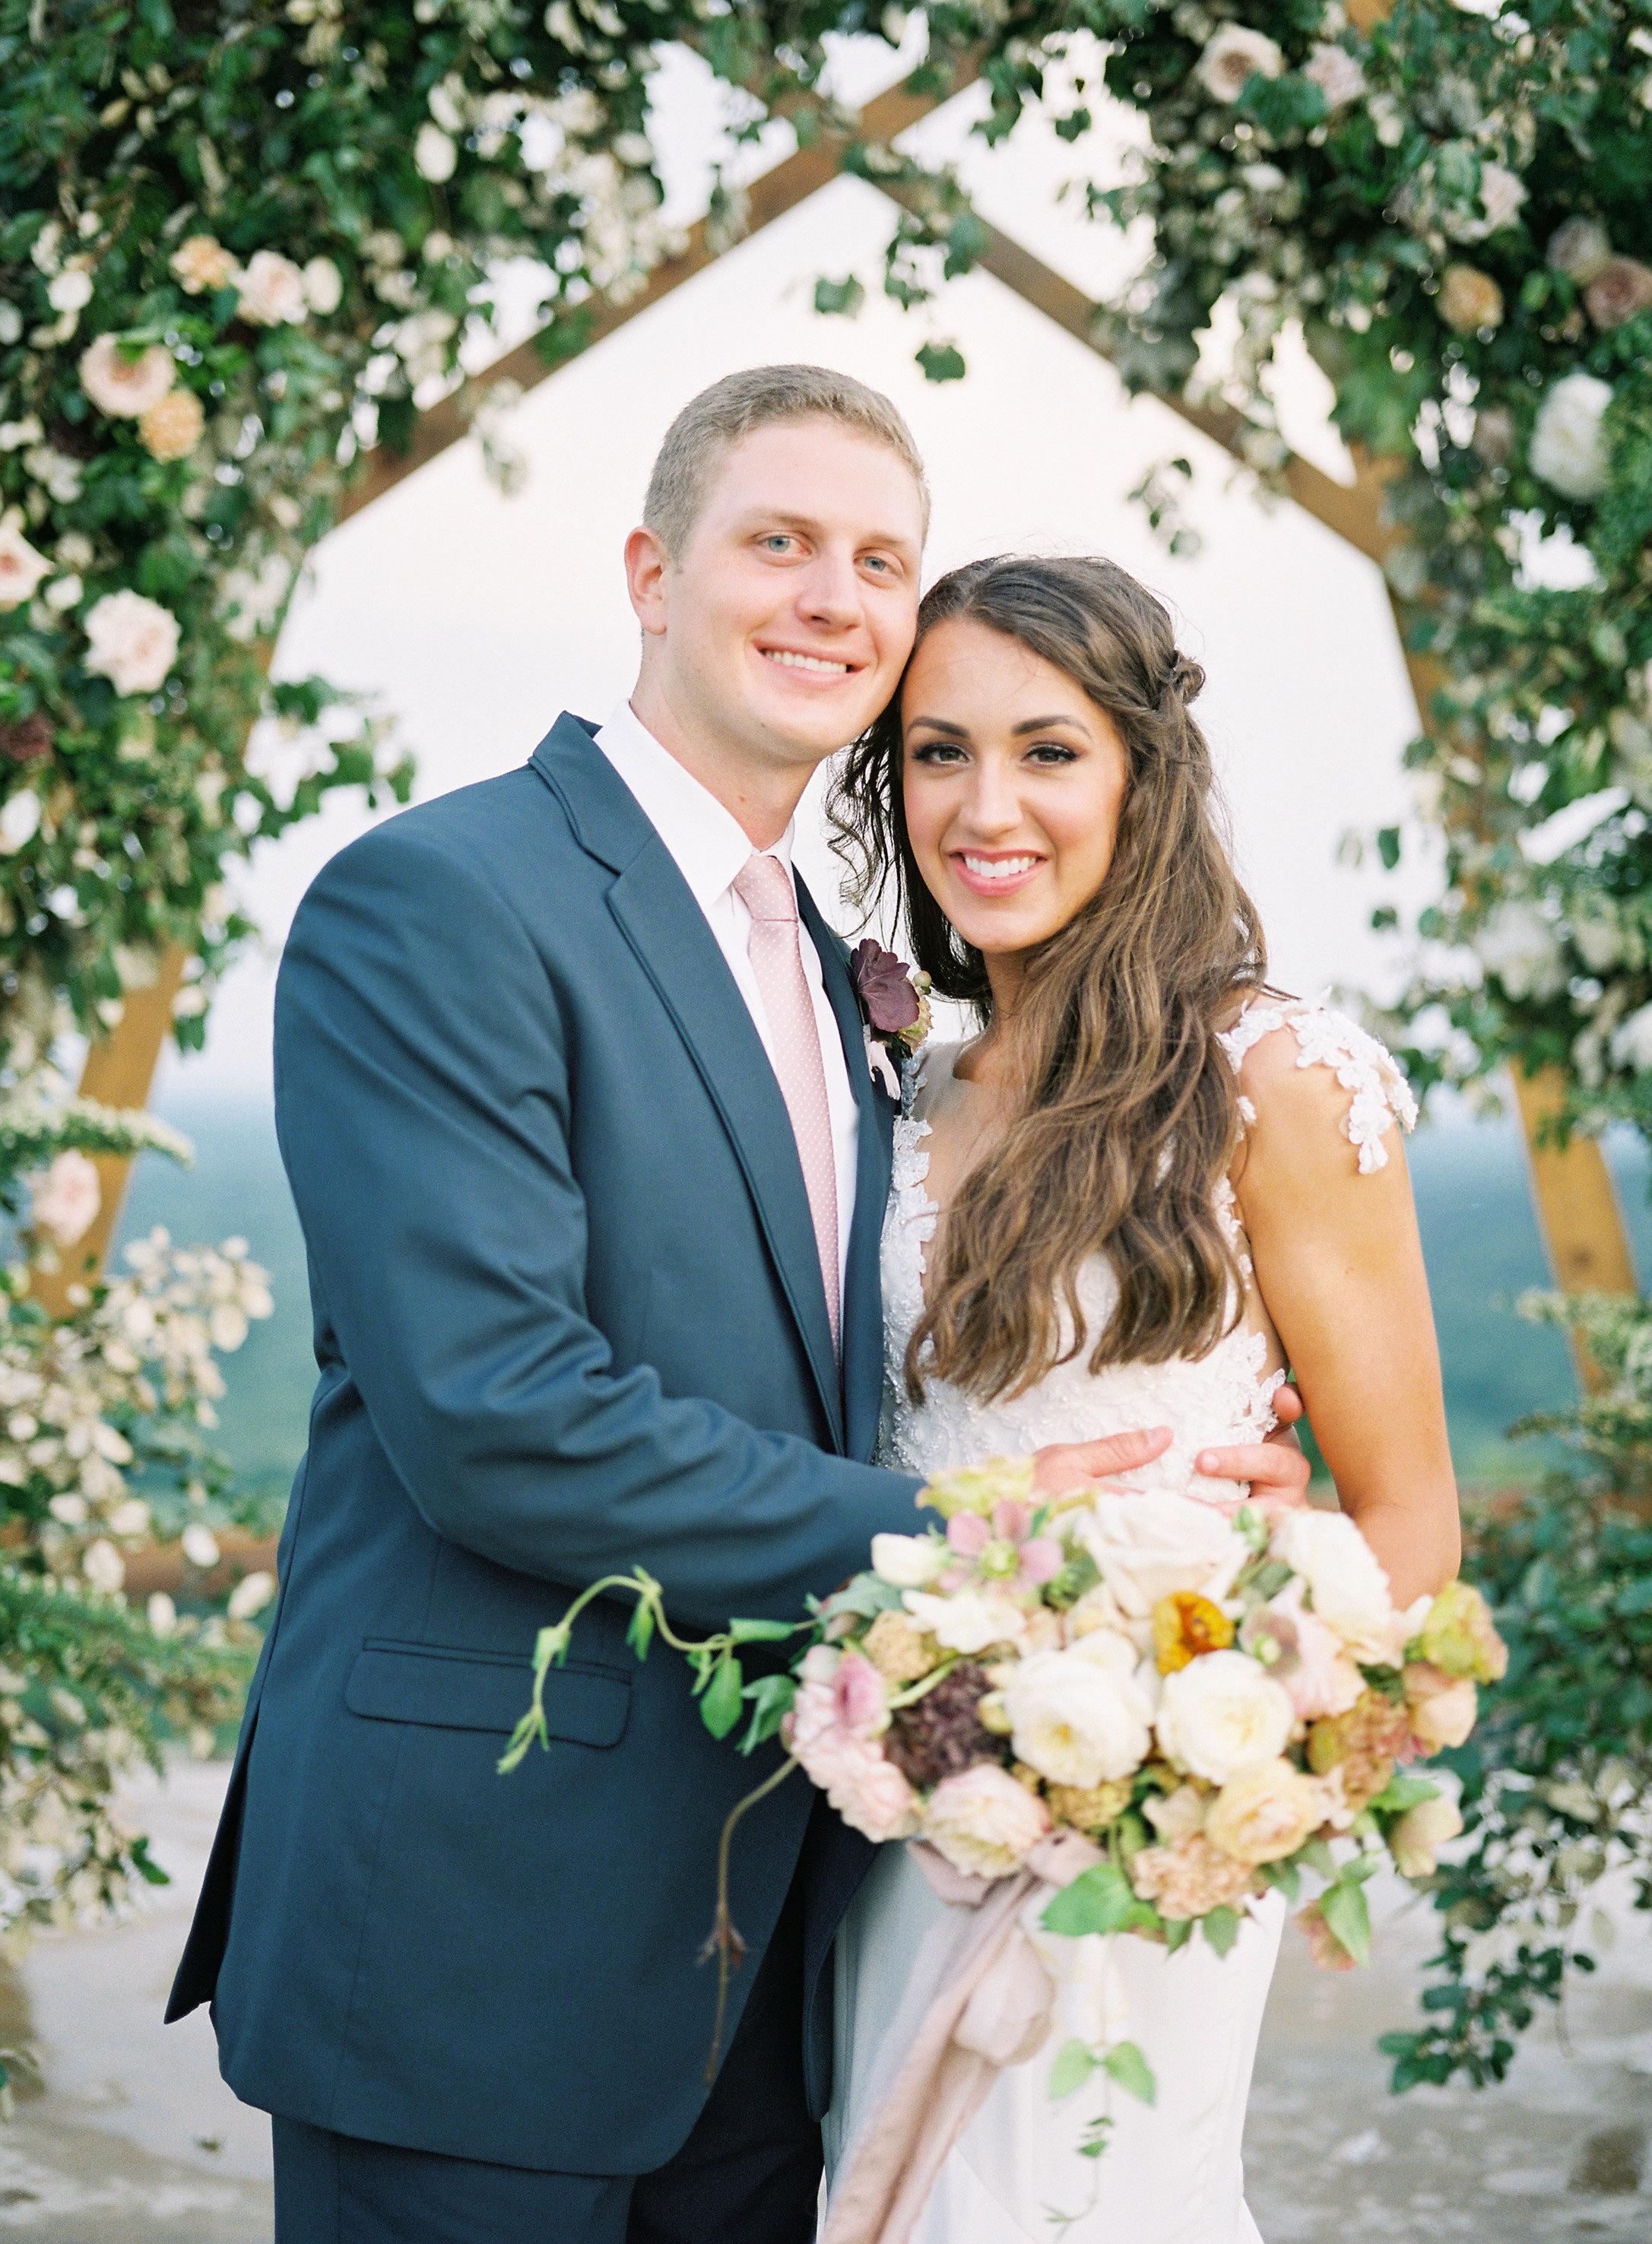 happy wedding couple pose under floral archway